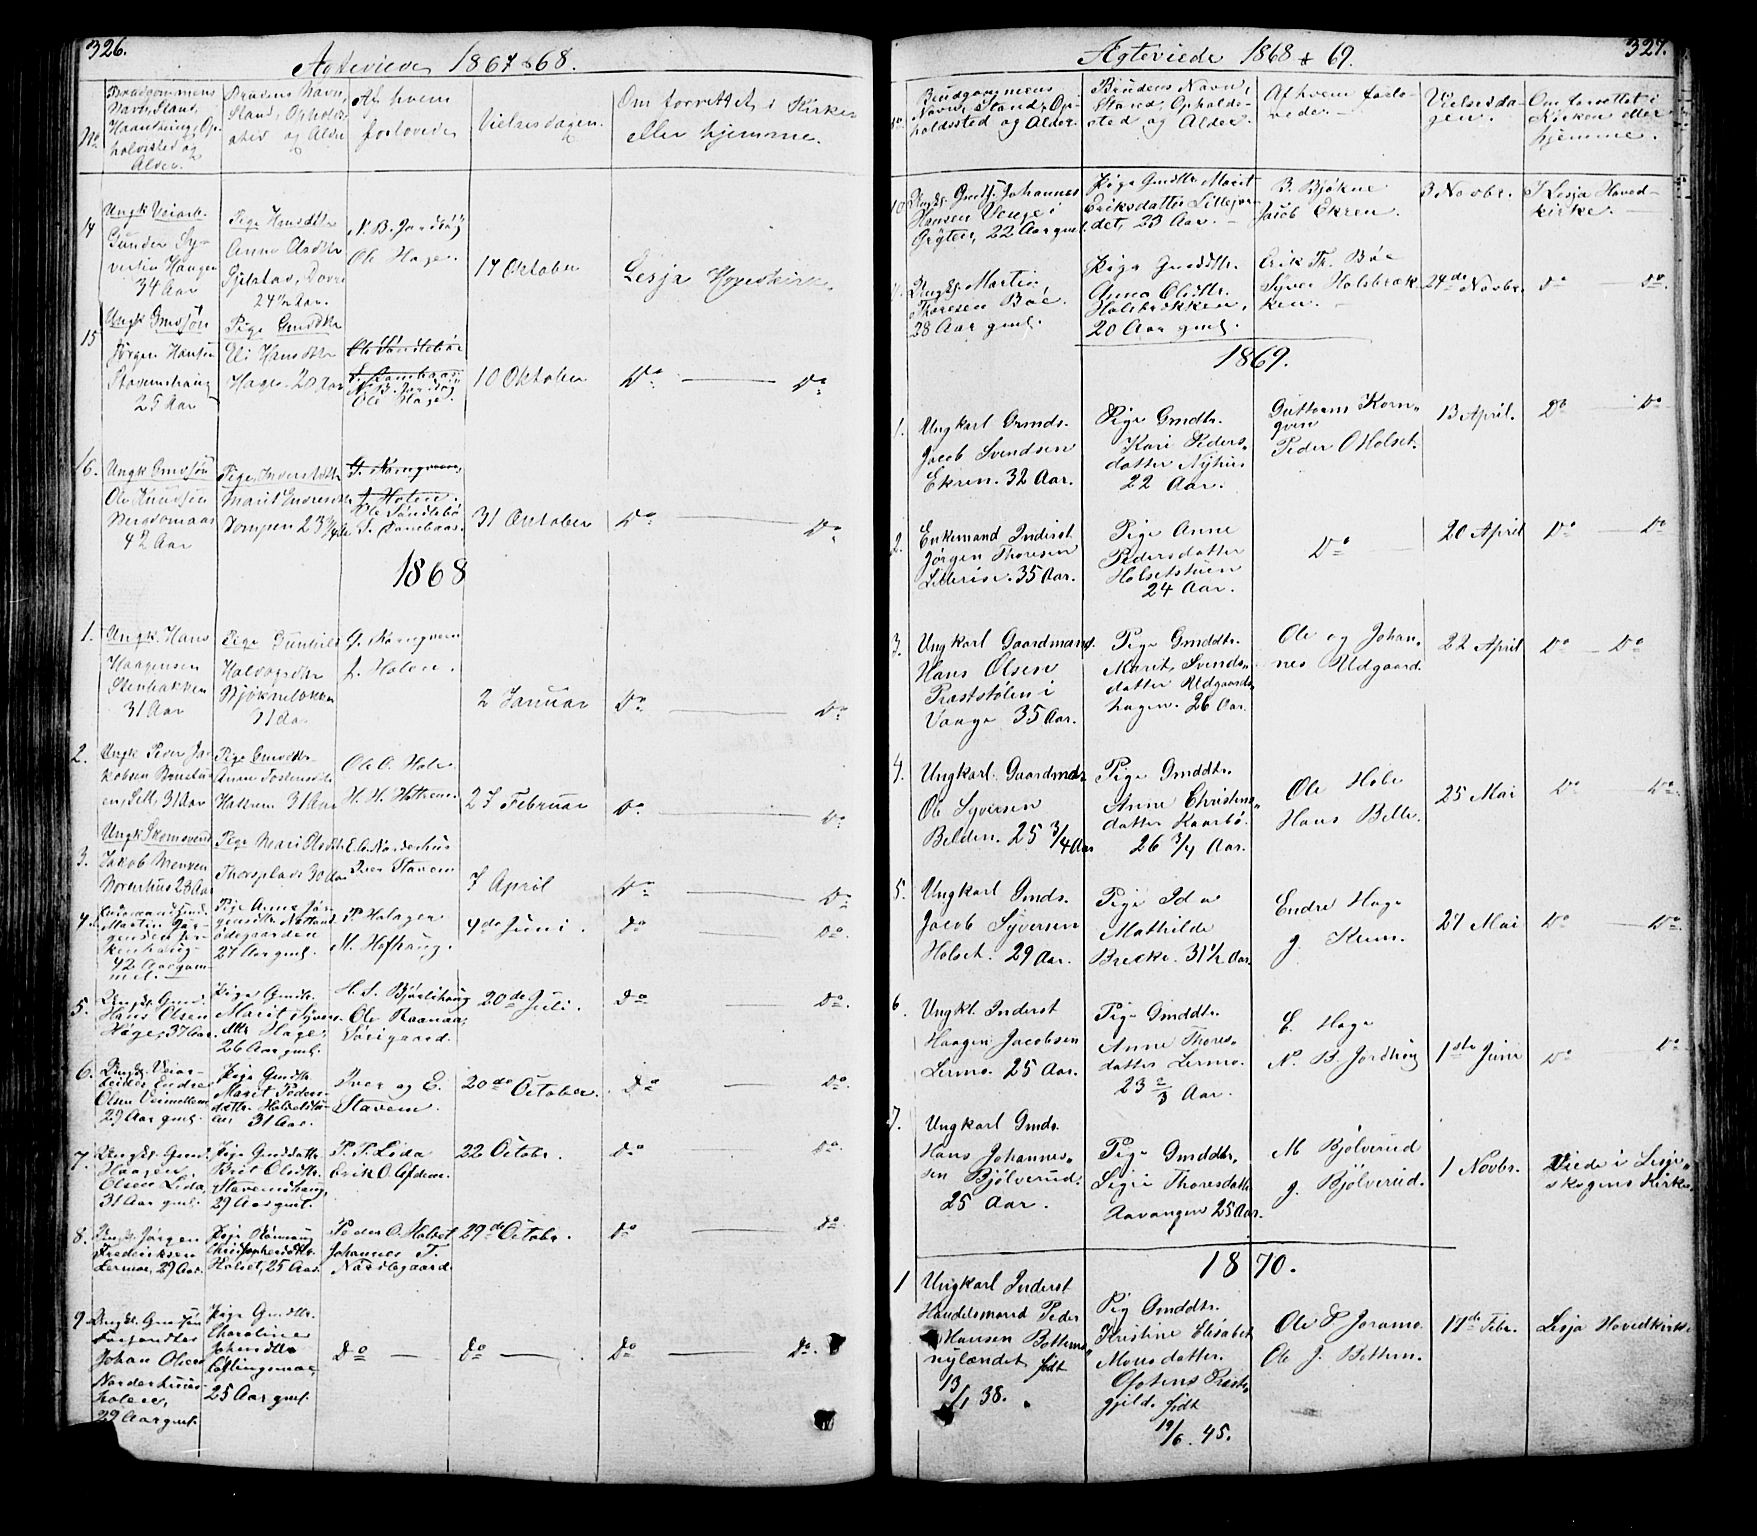 SAH, Lesja prestekontor, Klokkerbok nr. 5, 1850-1894, s. 326-327